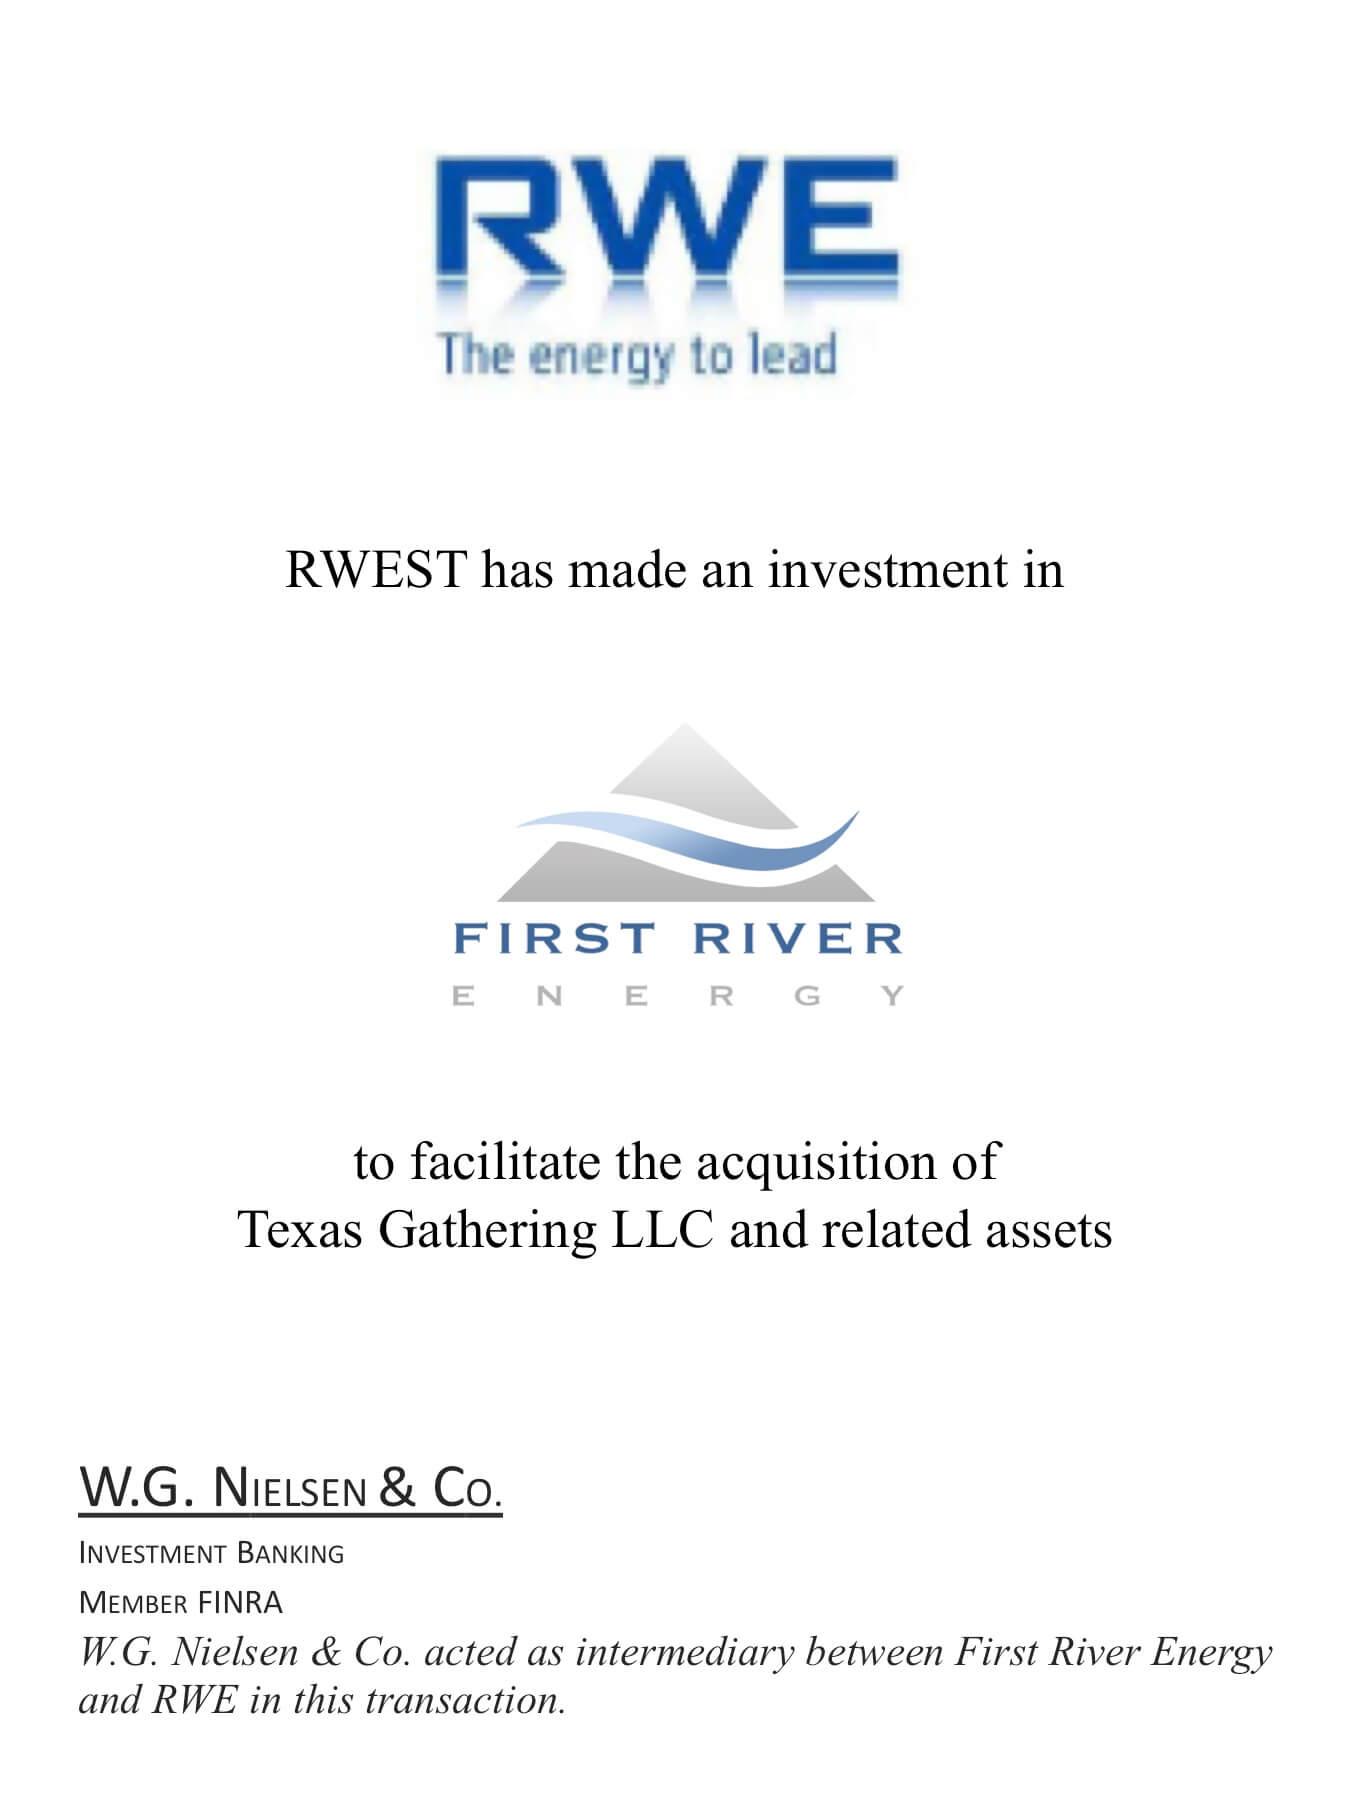 rwe investment banking transaction